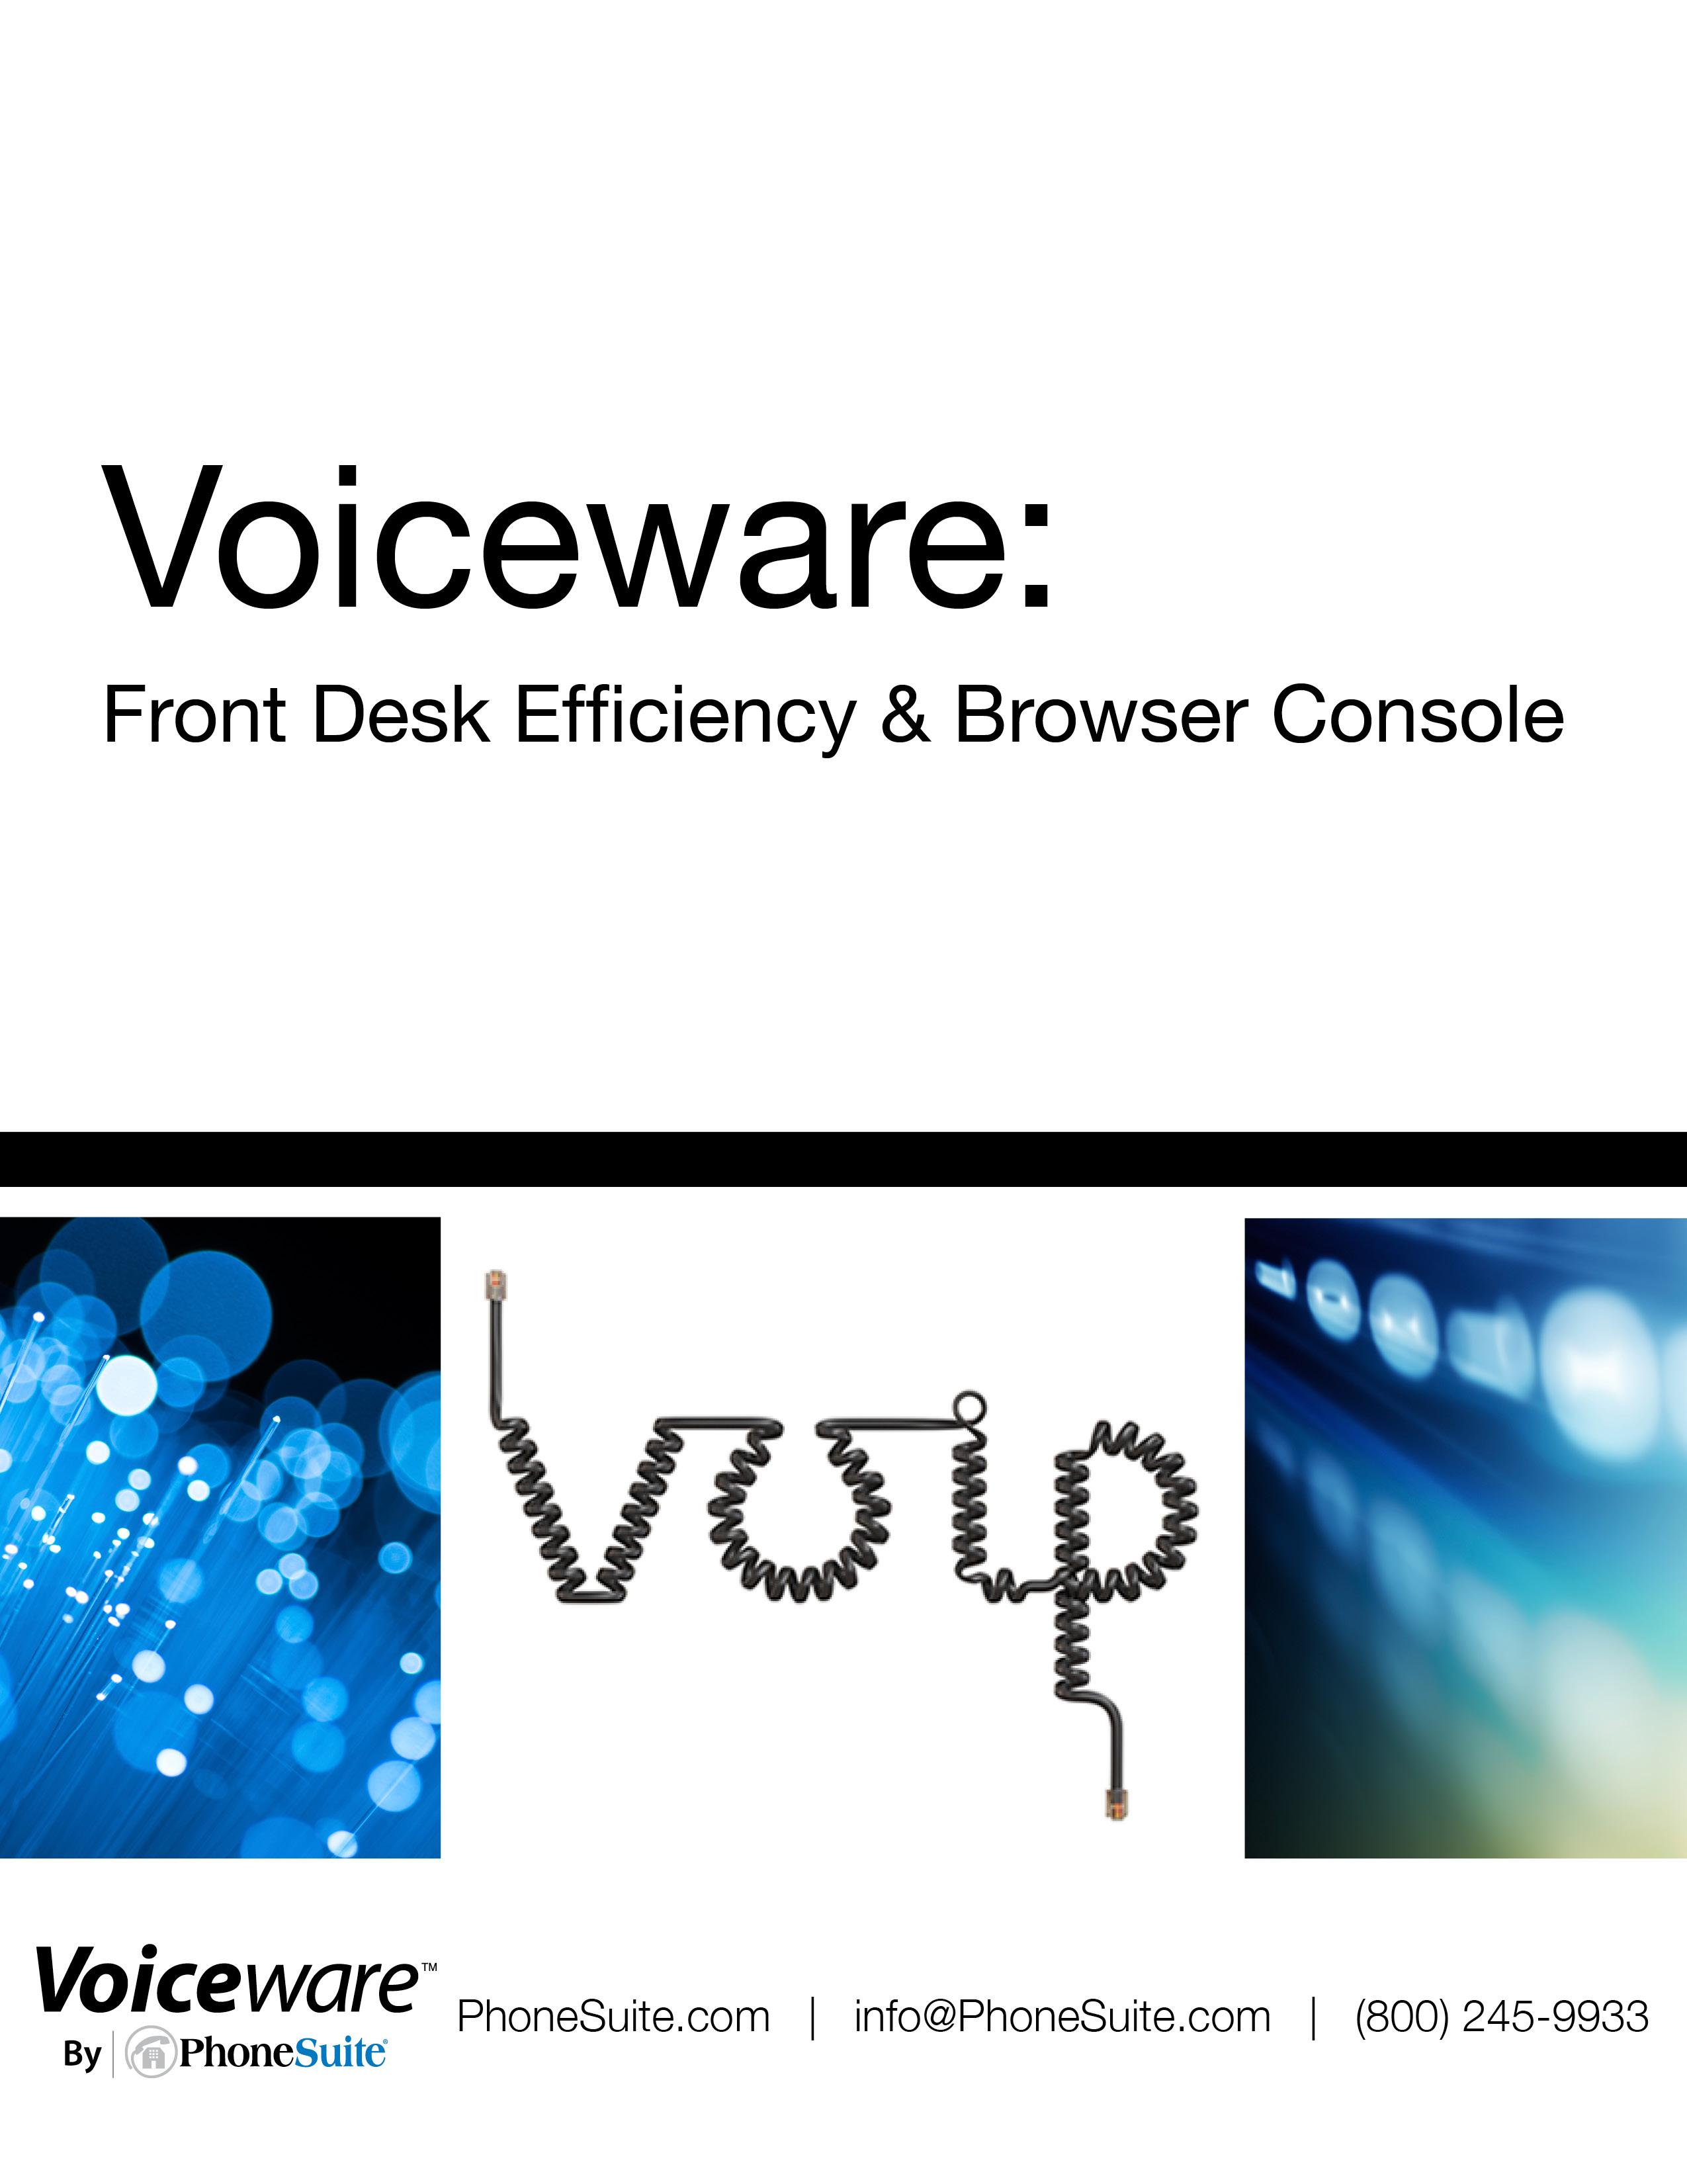 Voiceware Whitepaper: Front Desk & Browser Console